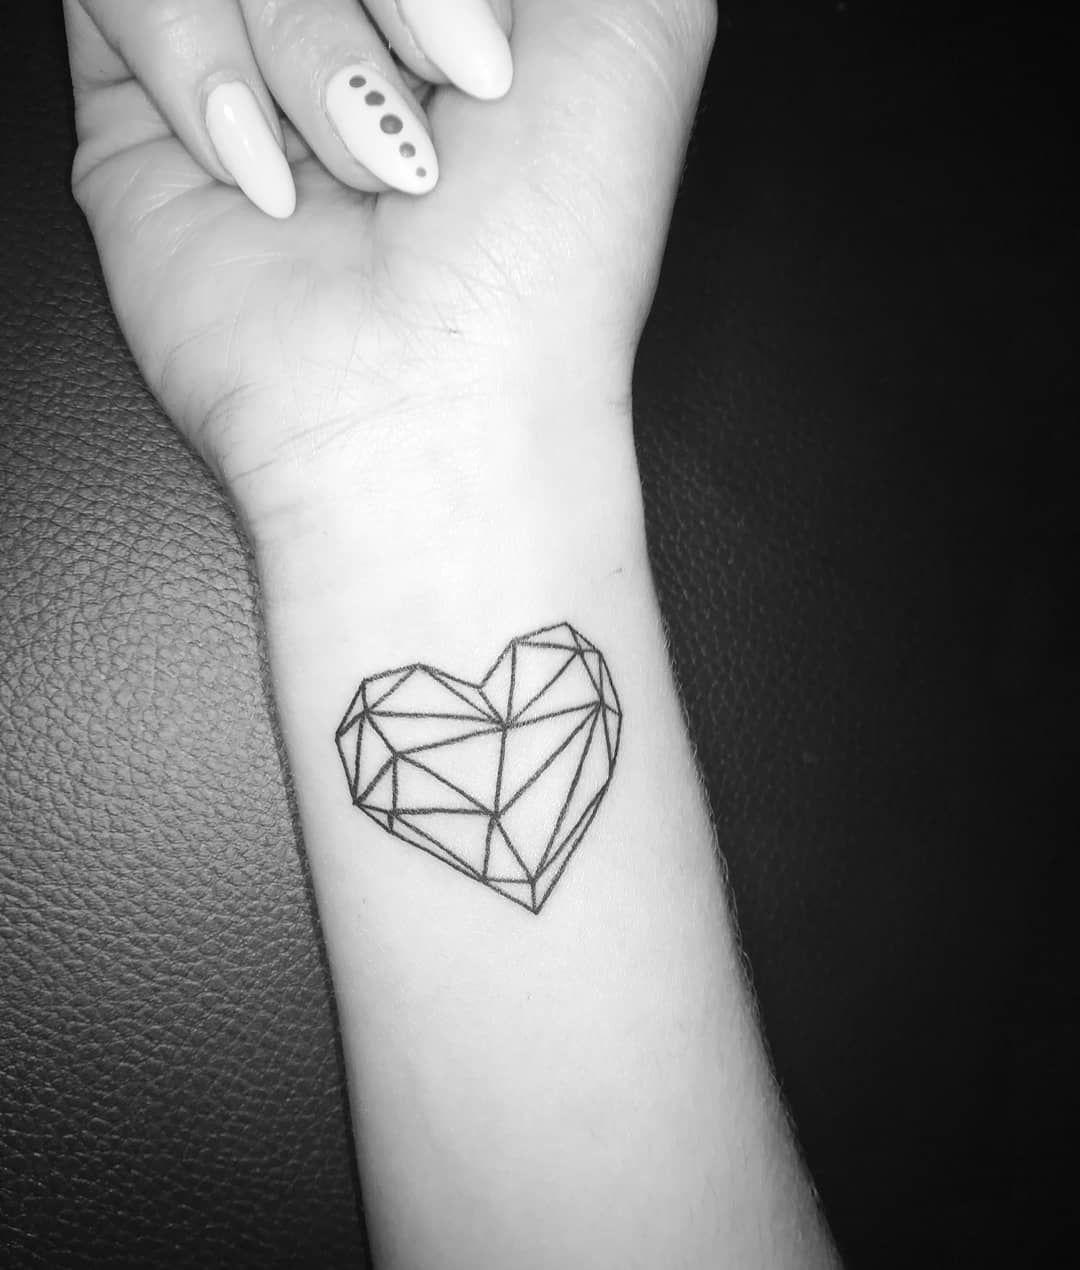 Banditotattoo Polstattoo Pols Tattoo Abstract Lijnwerk